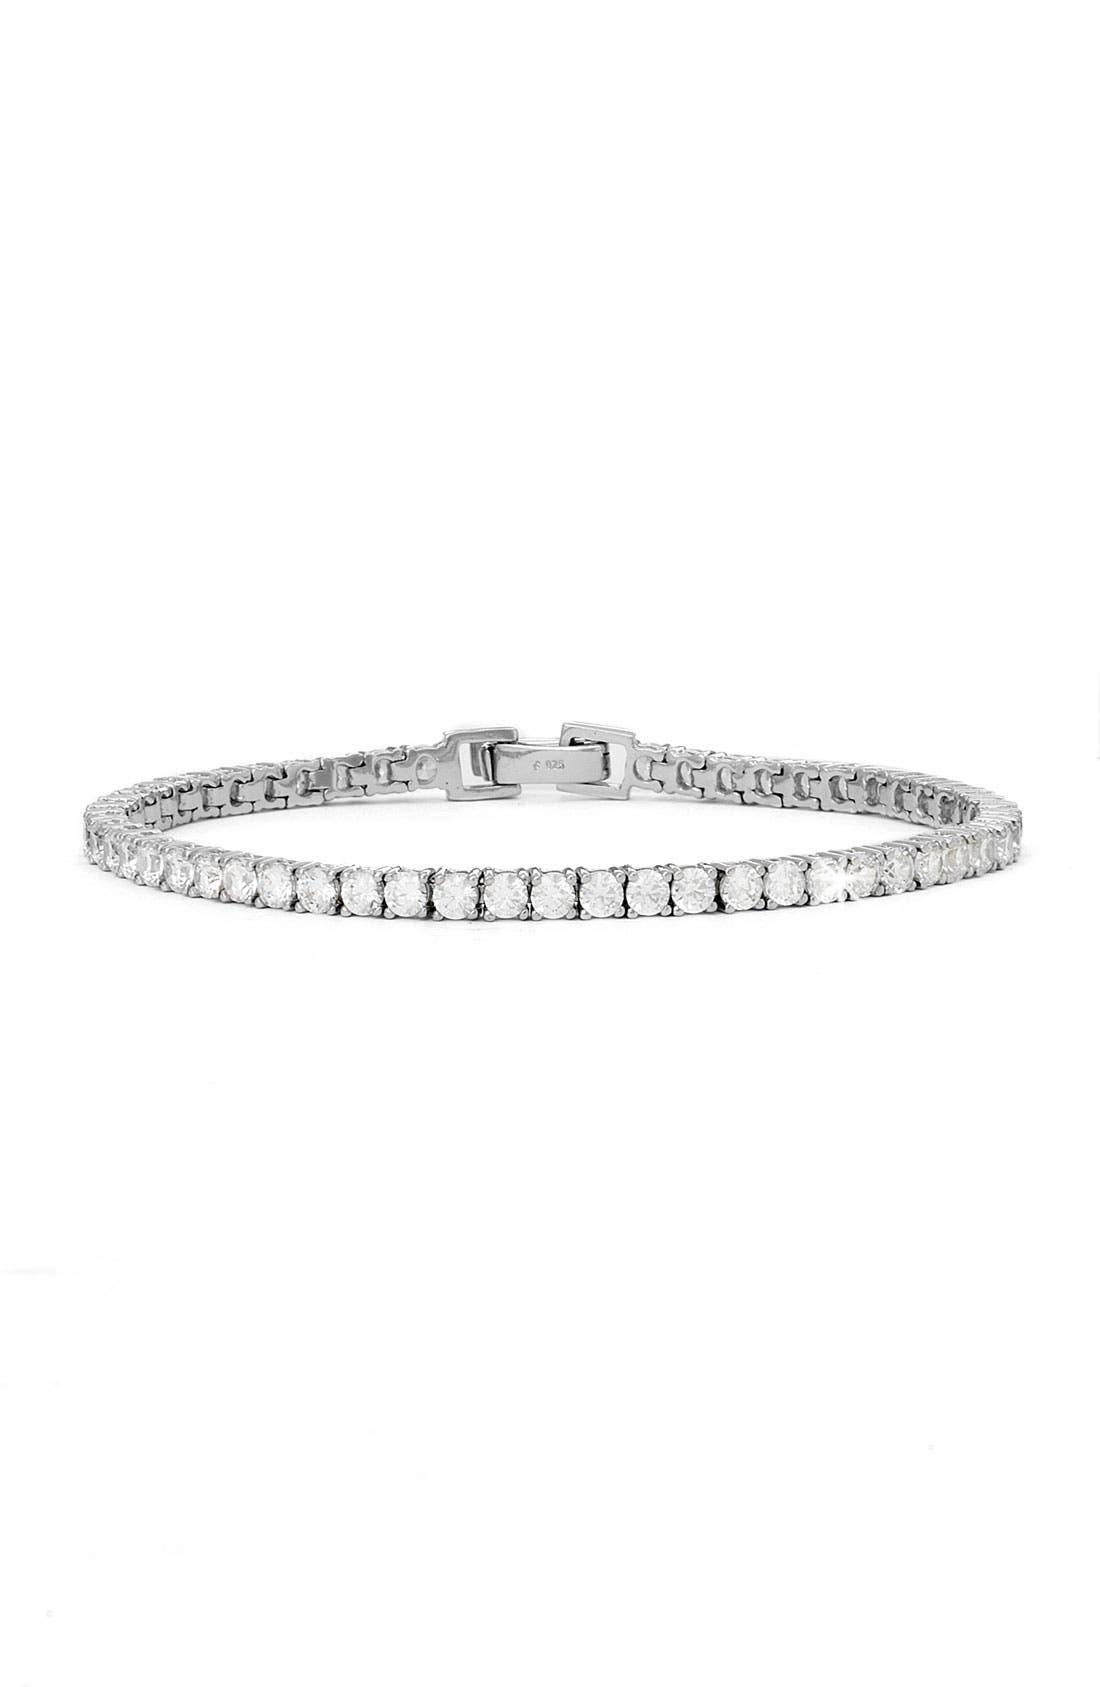 Main Image - Nordstrom Tennis Bracelet